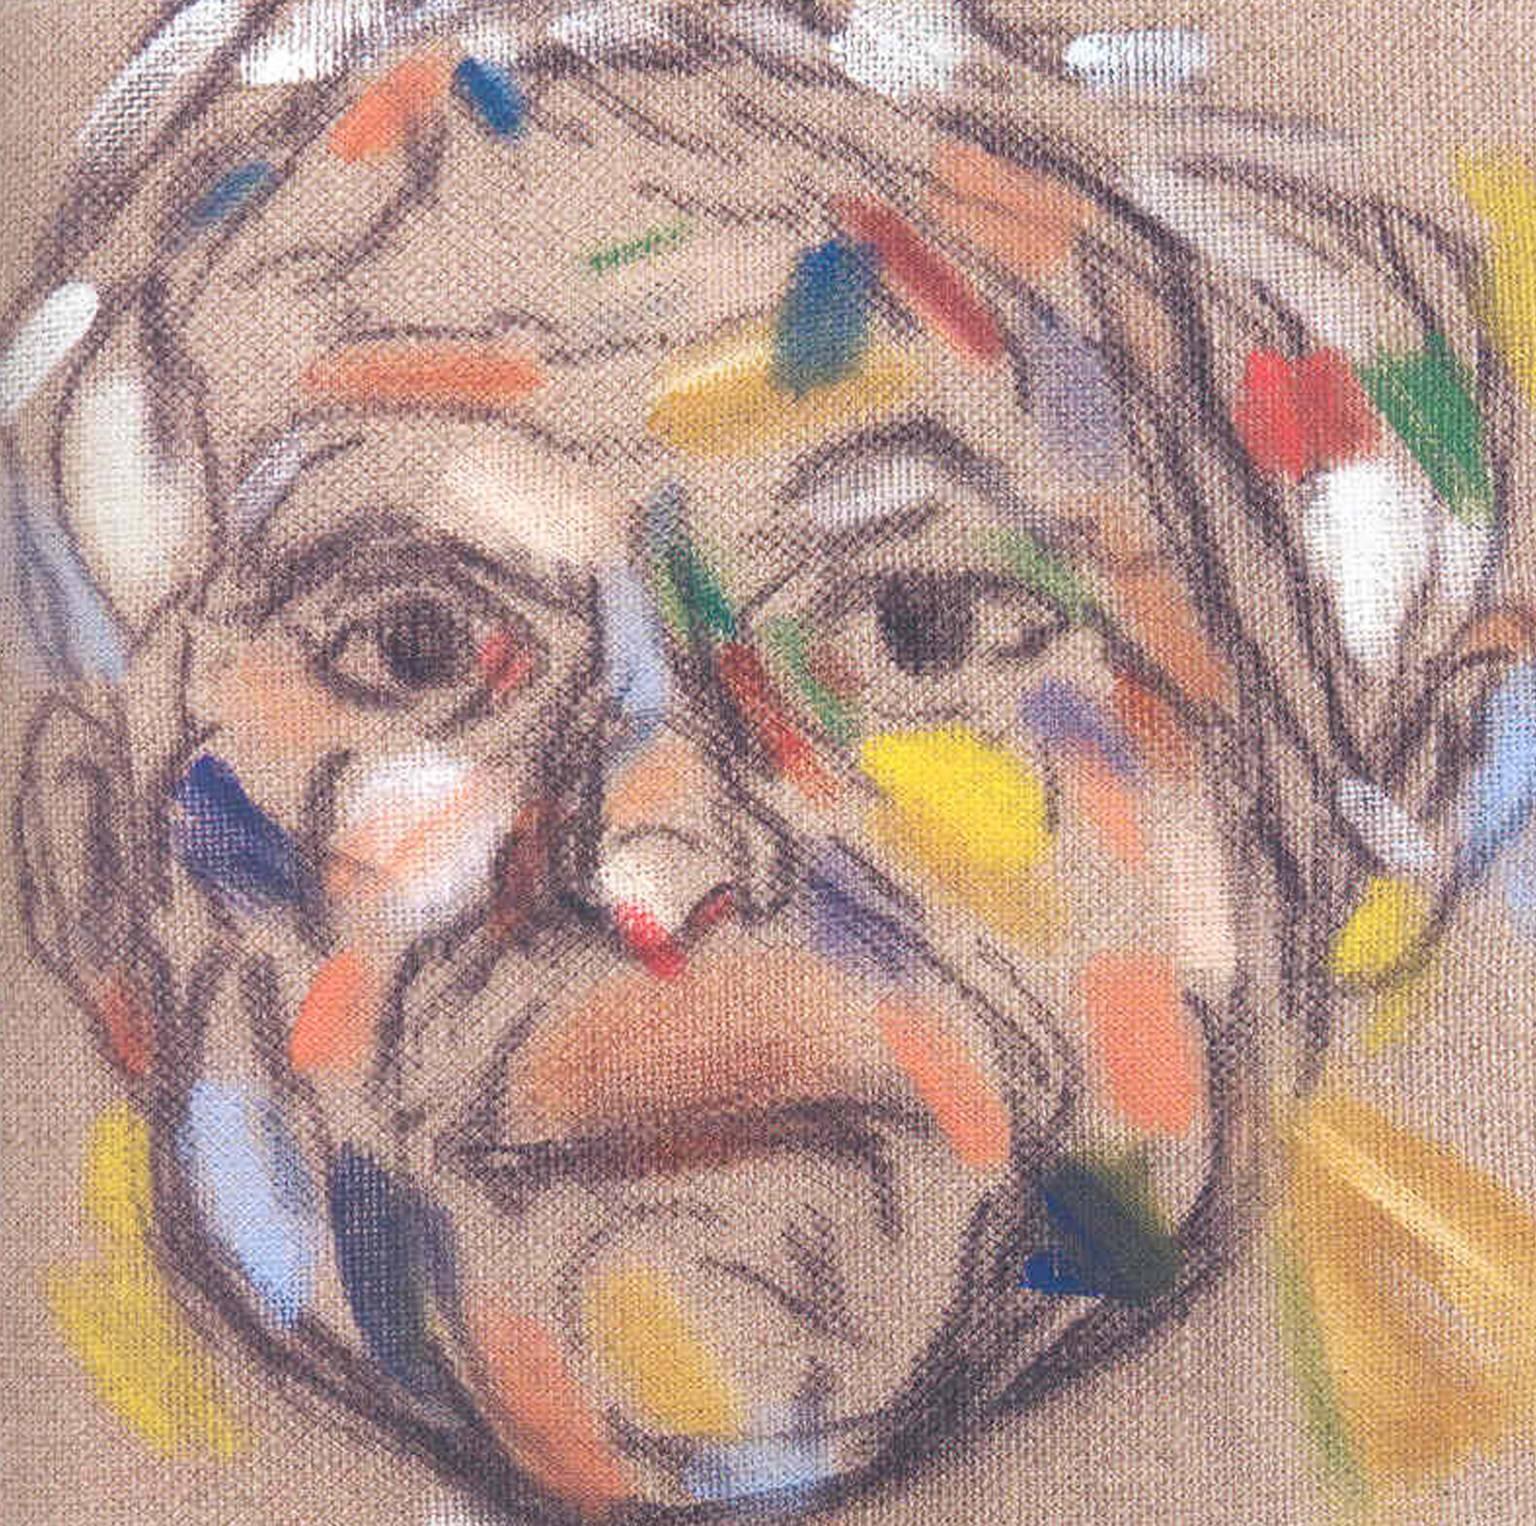 Self-portrait 2007 R.B. Kitaj 1932-2007 Presented  by the family of R. B.  Kitaj from the Estate of the artist 2010 http://www.tate.org.uk/art/work/T13010